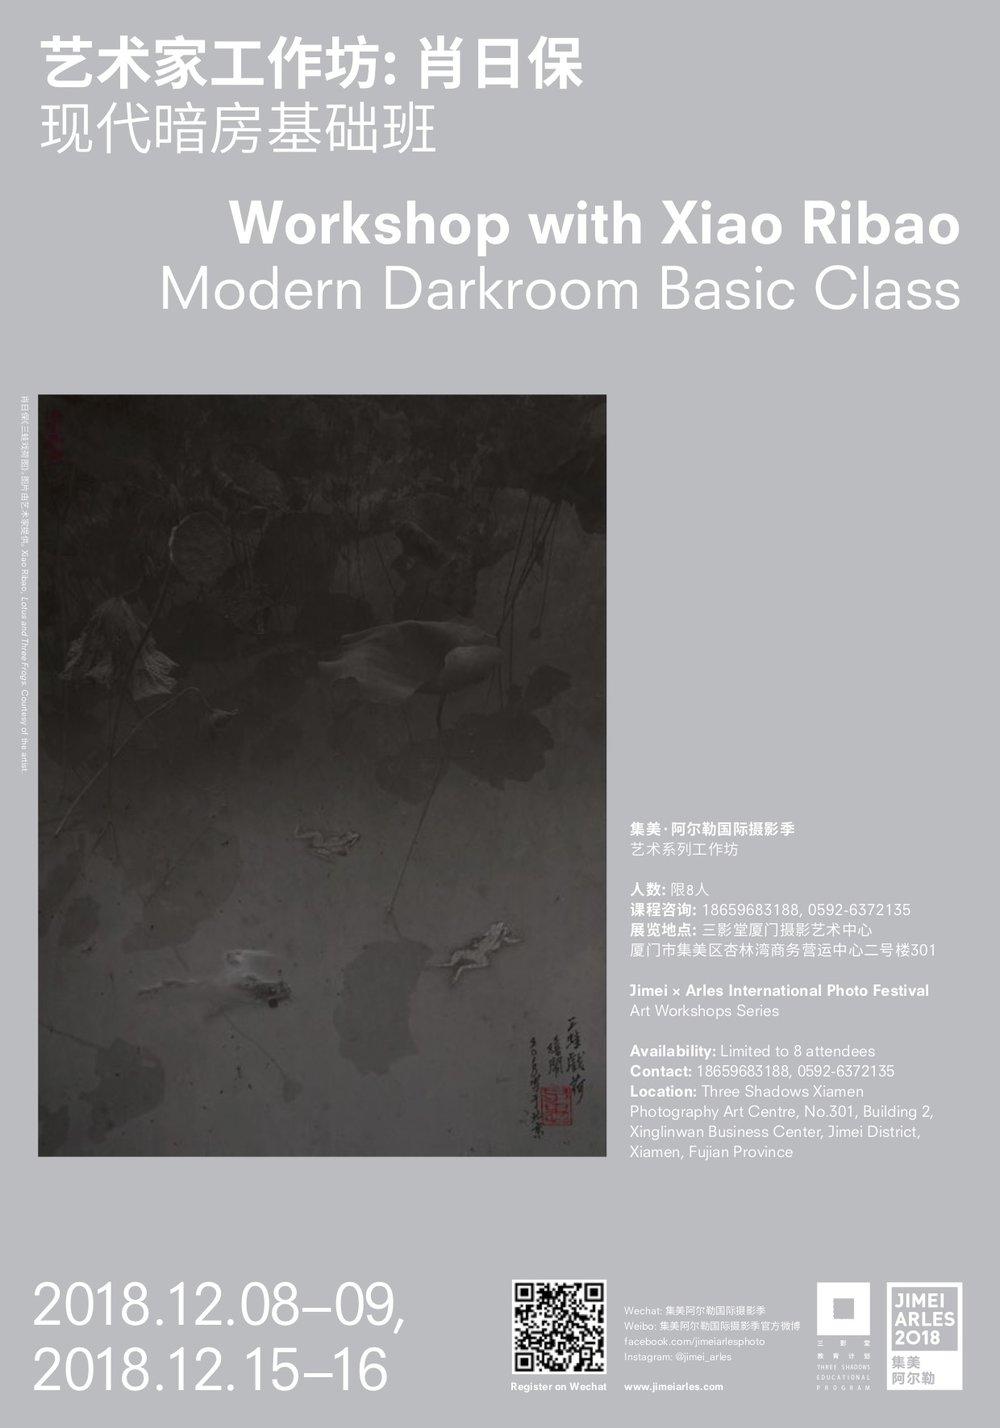 JIMEIARLES_Workshop Poster_Digital_Xiao_Ribao.jpg